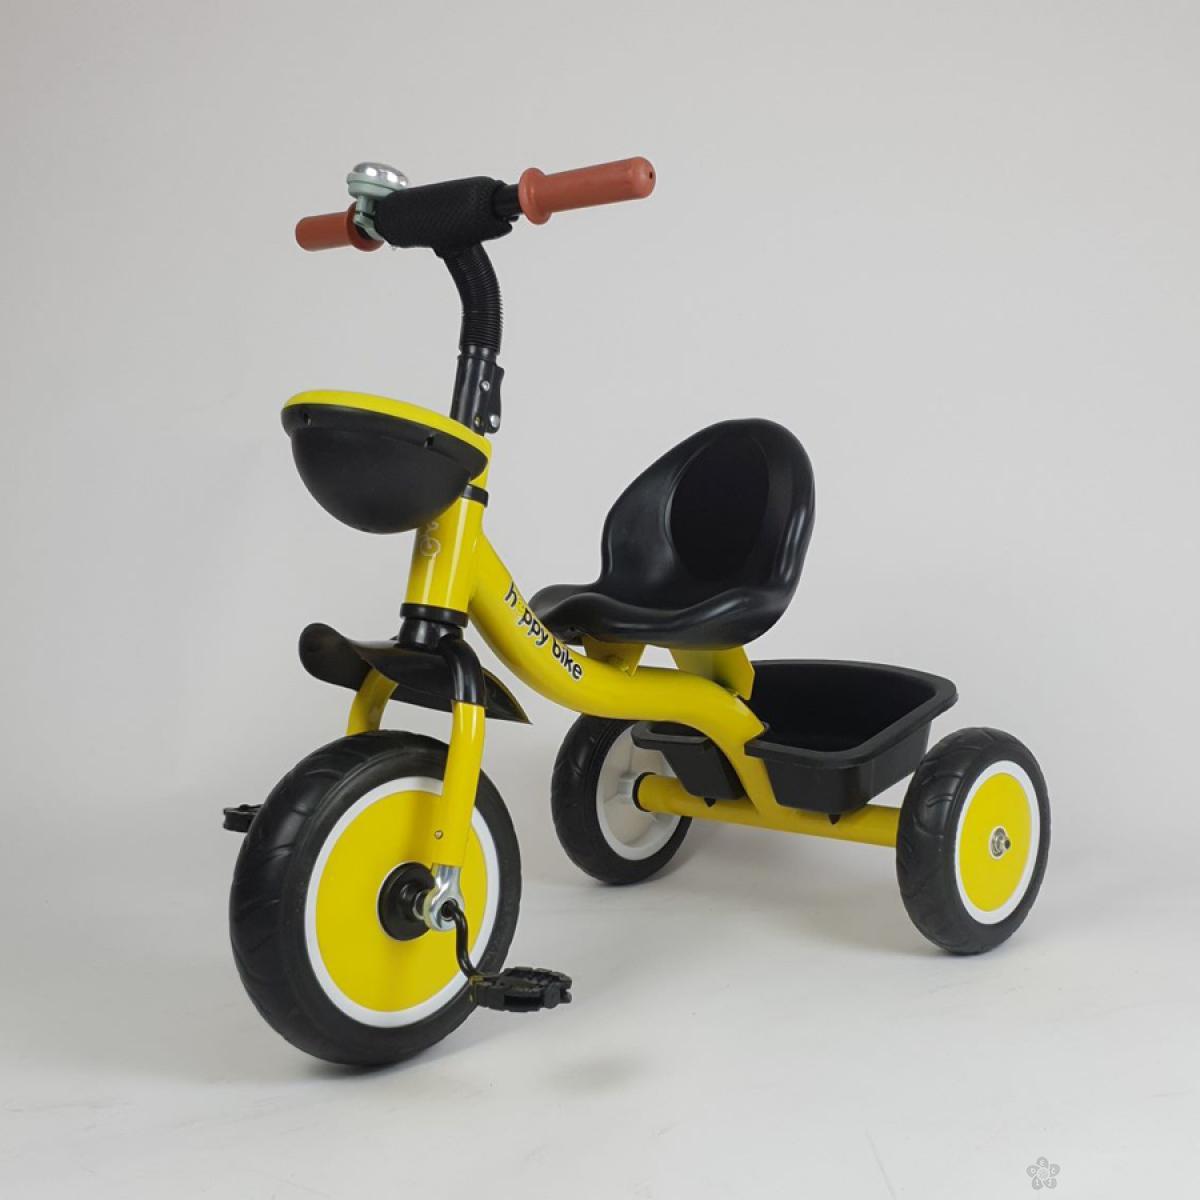 Tricikl HappyBike Denis model 427 žuti